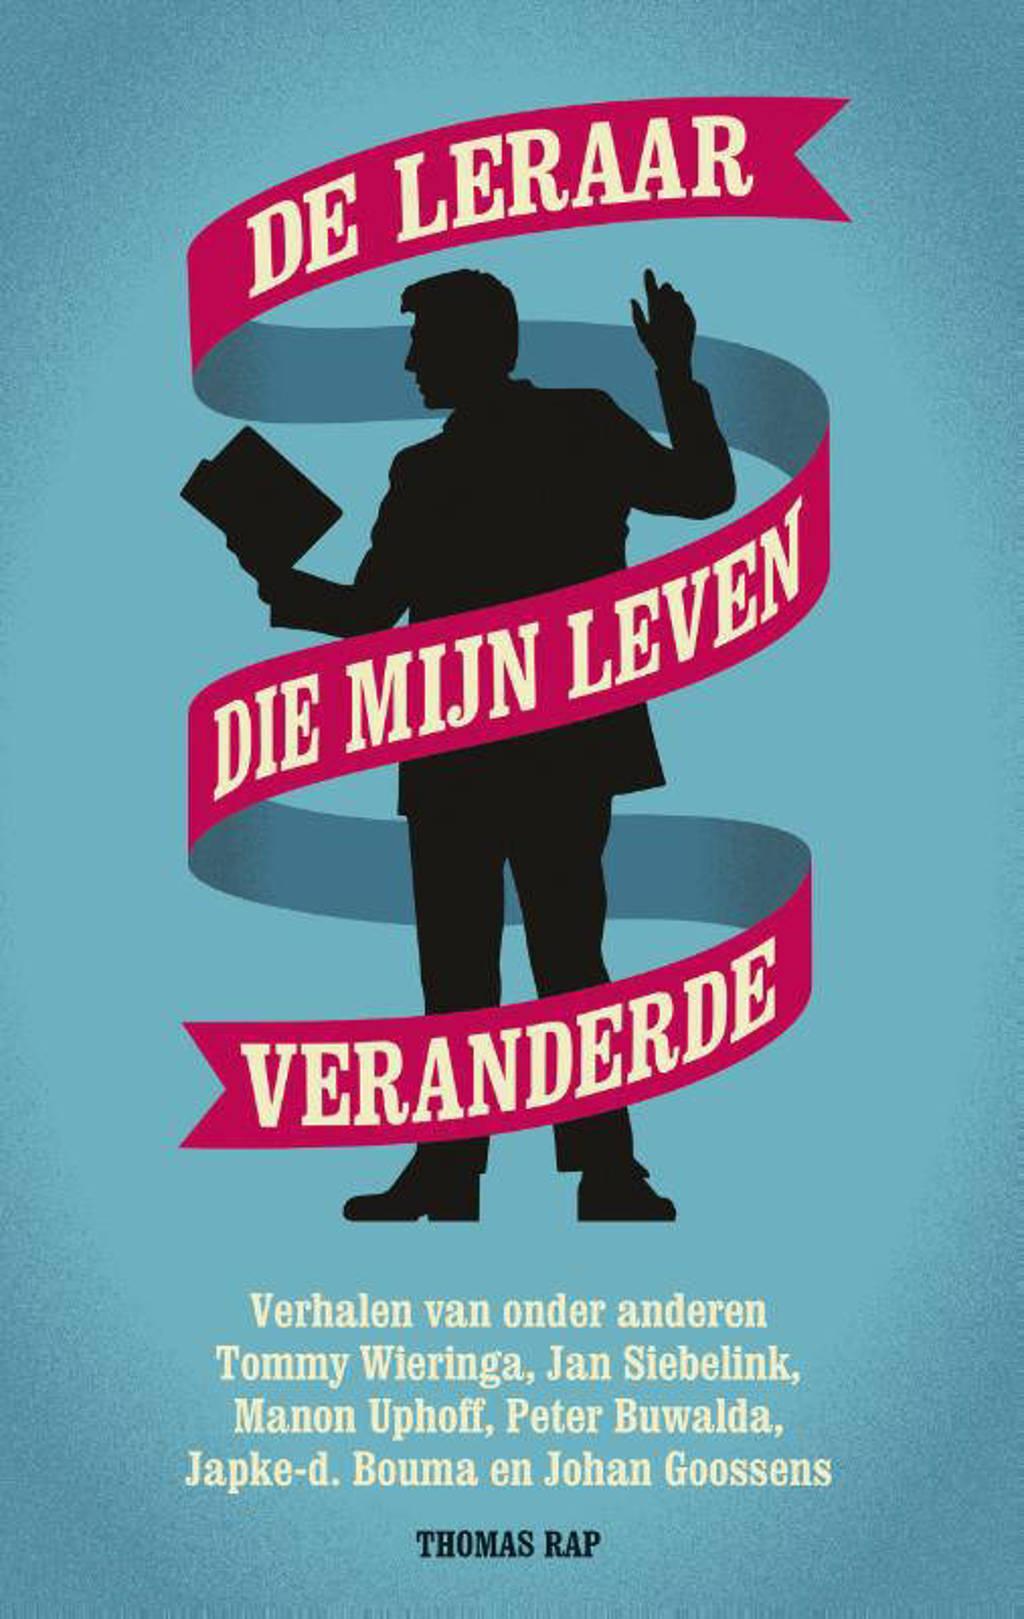 De leraar die mijn leven veranderde - Tommy Wieringa, Jan Siebelink, Manon Uphoff, e.a.